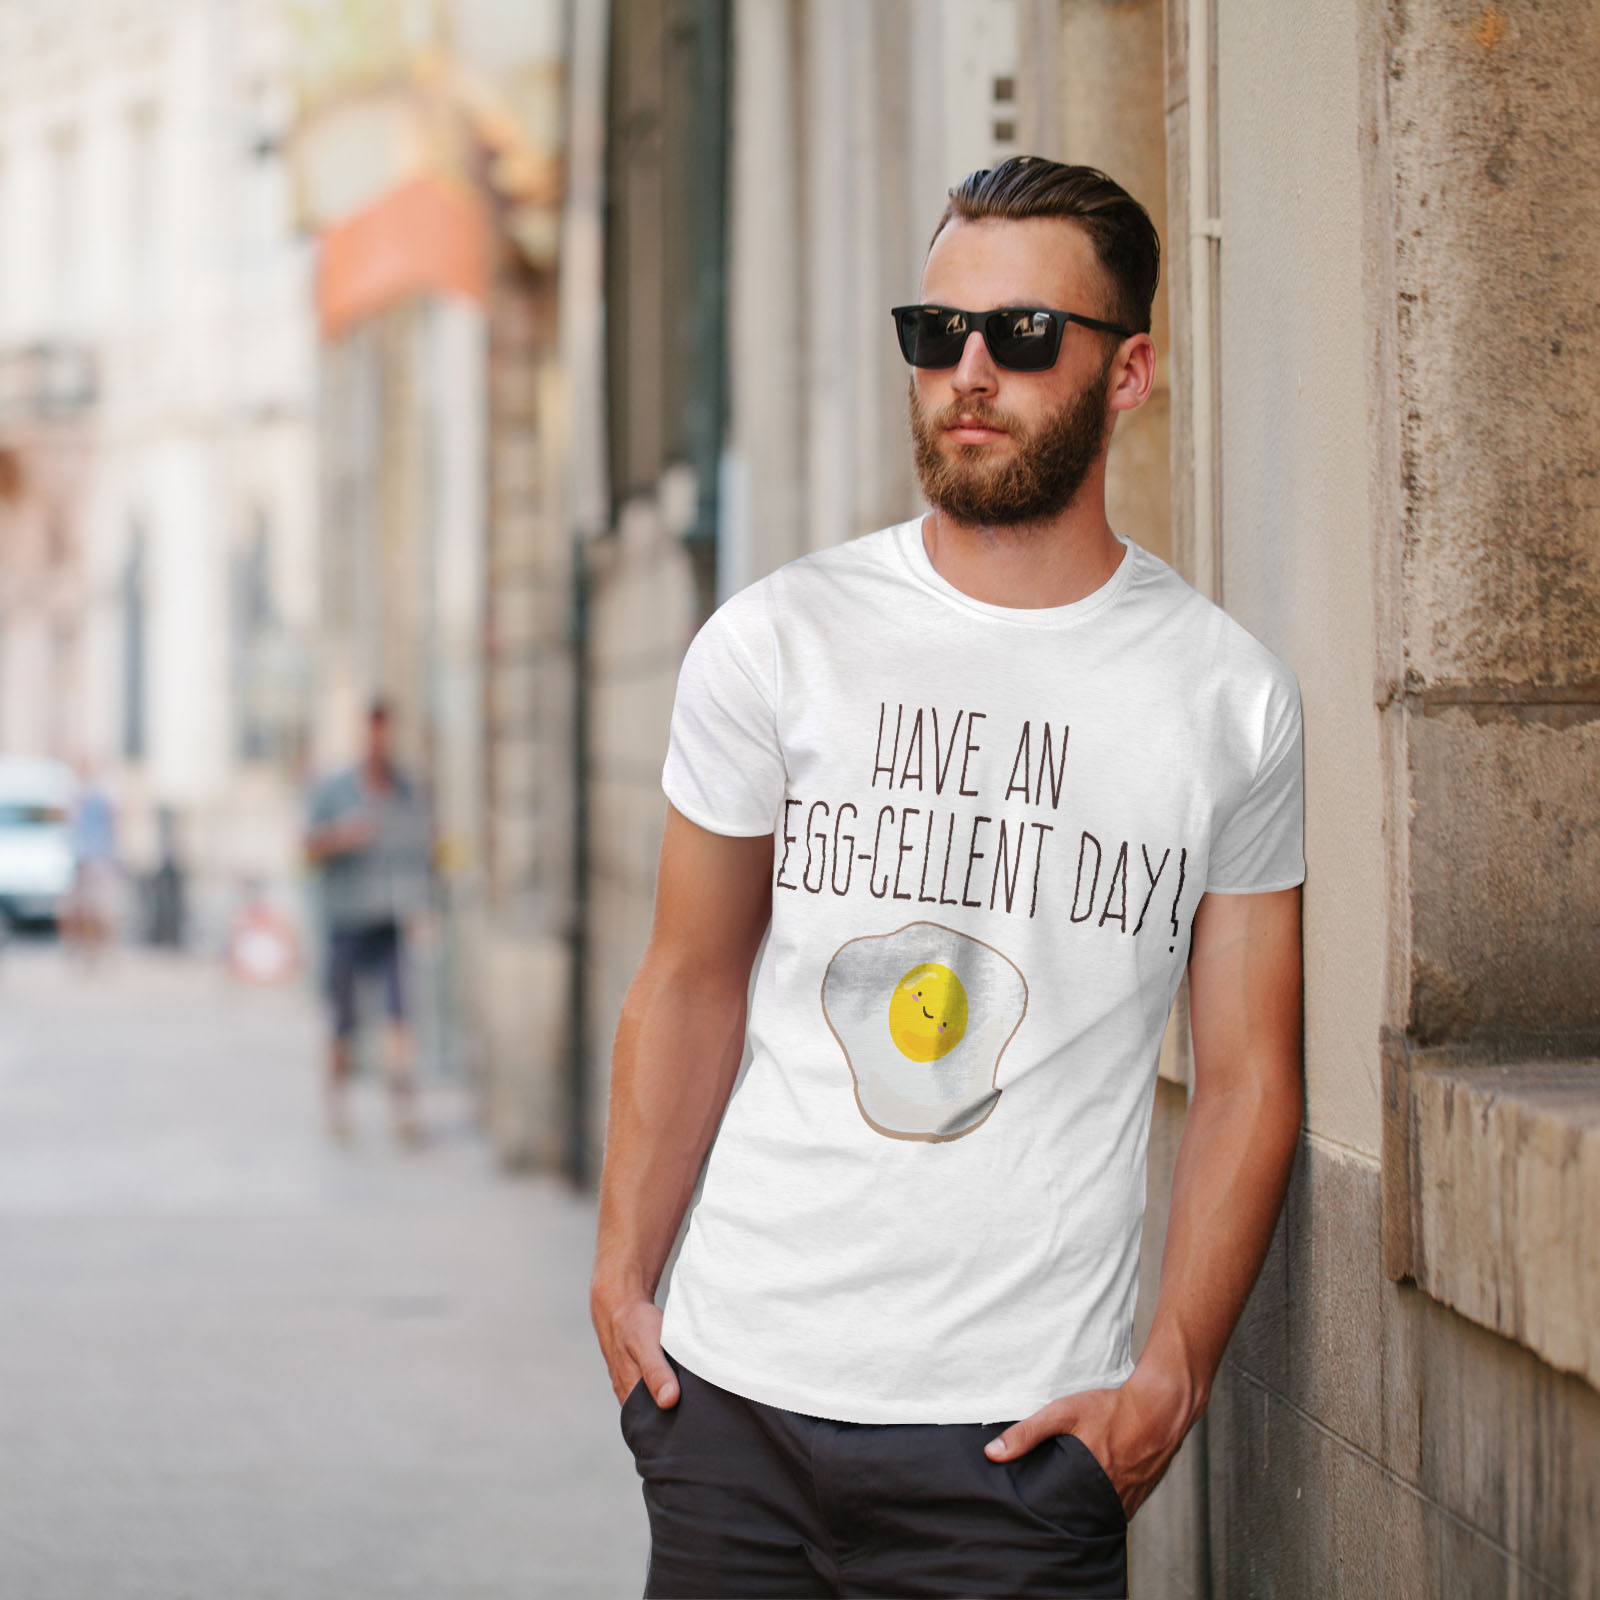 ottimo design grafico stampato T-shirt Wellcoda UOVO Positivo Da Uomo T-shirt